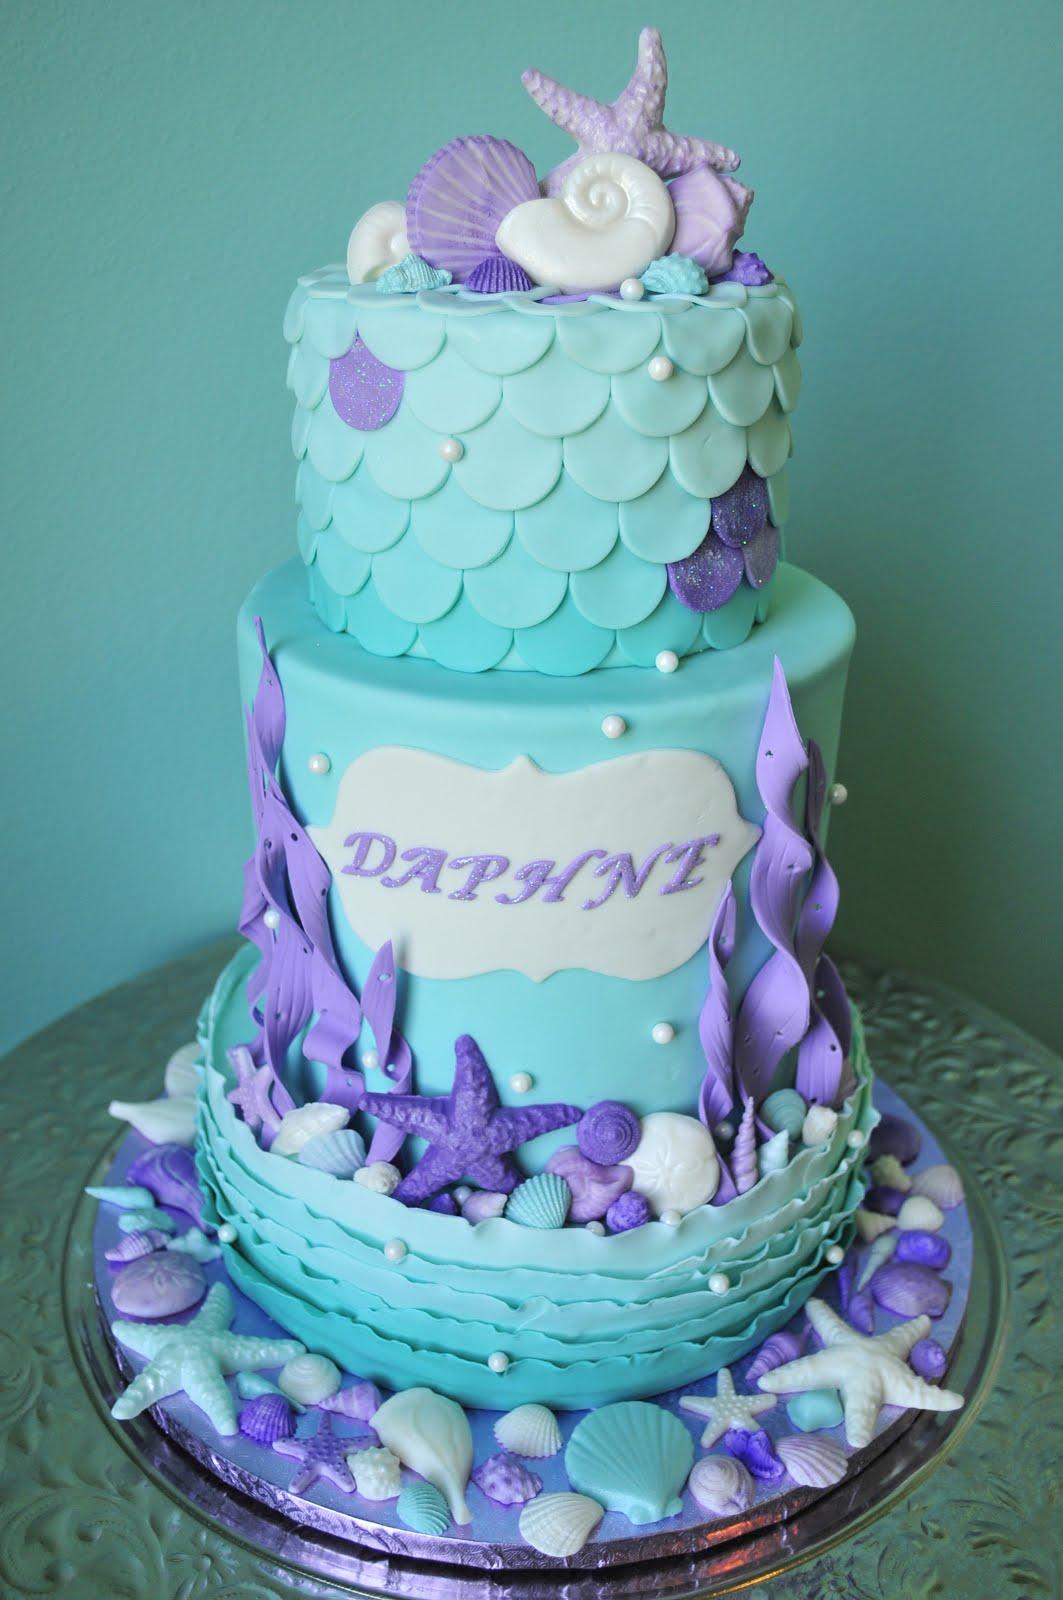 Lindsay S Custom Cakes